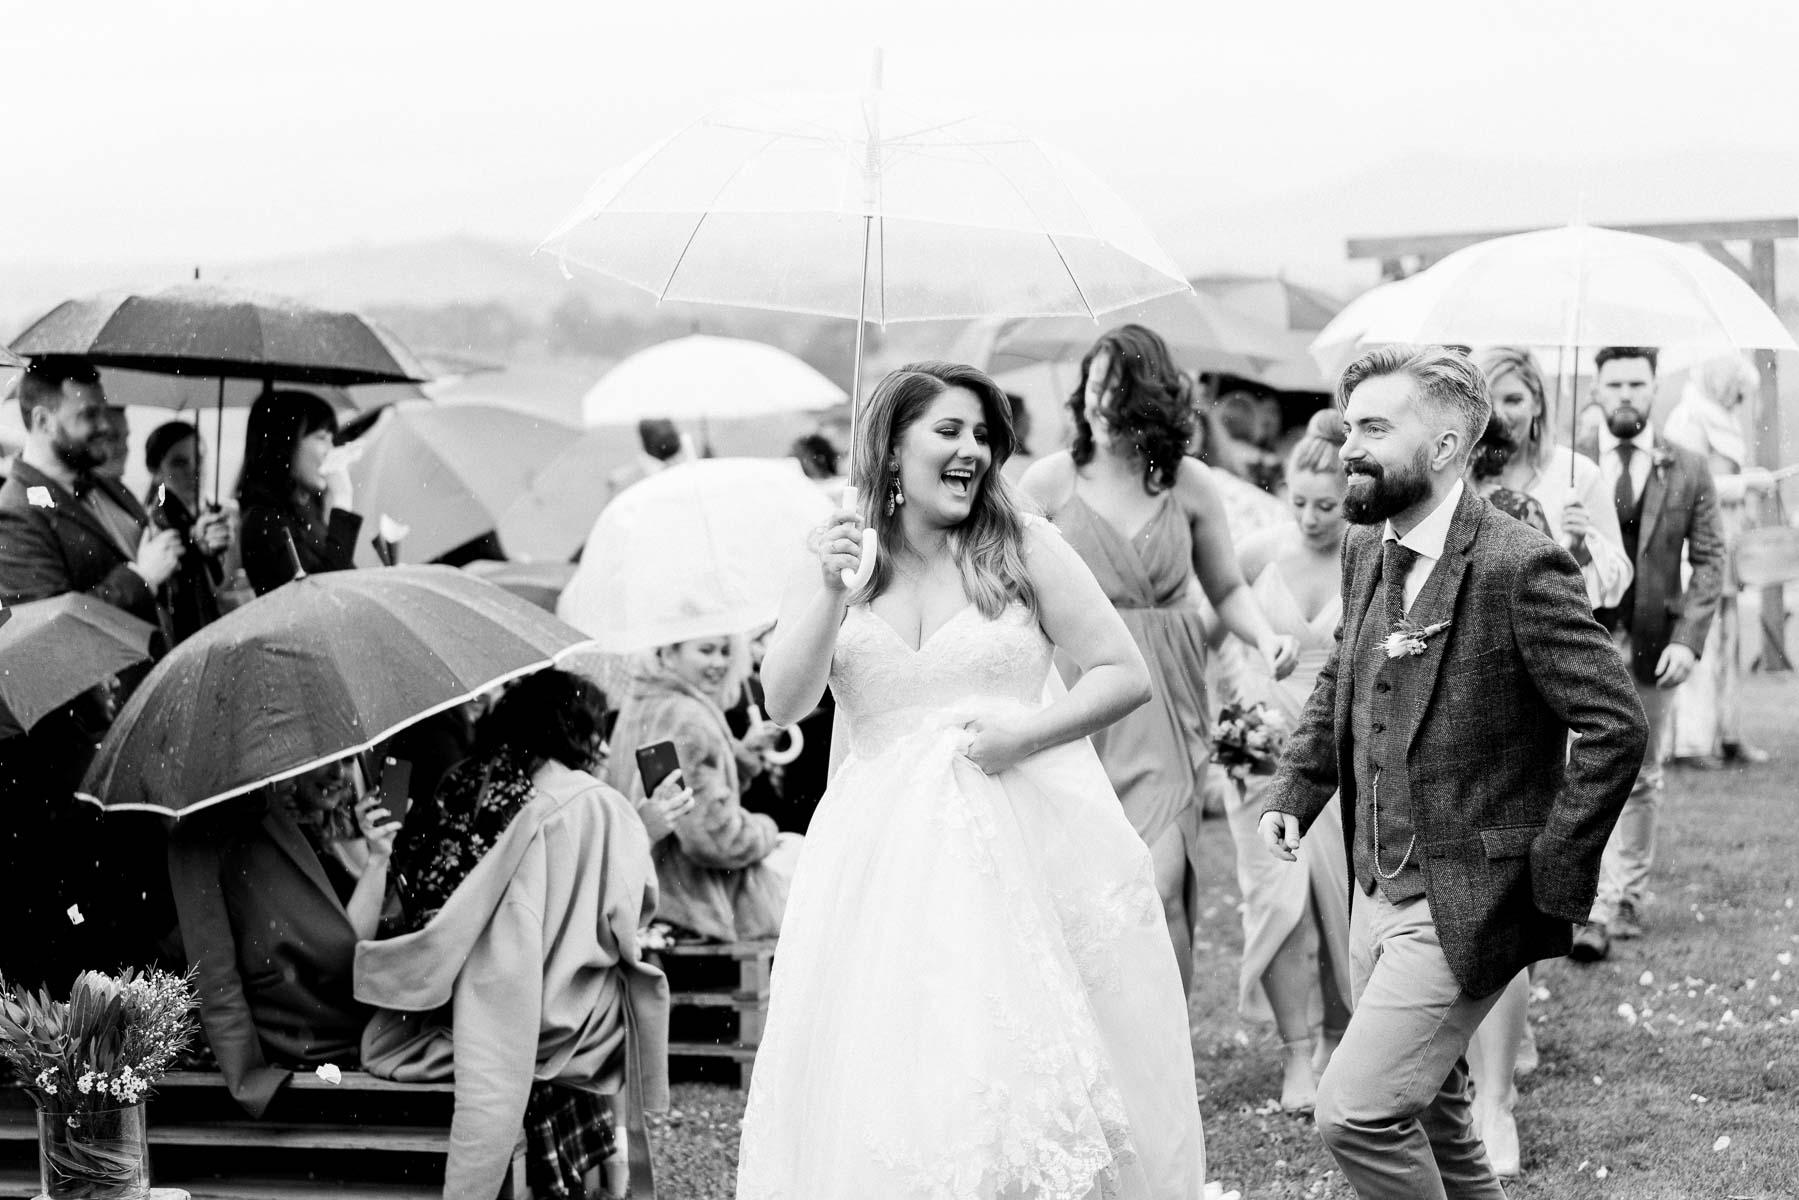 adams-farm-coldstream-yarra-valley-wedding-heart+soul-weddings-kel-jarryd-05157.jpg